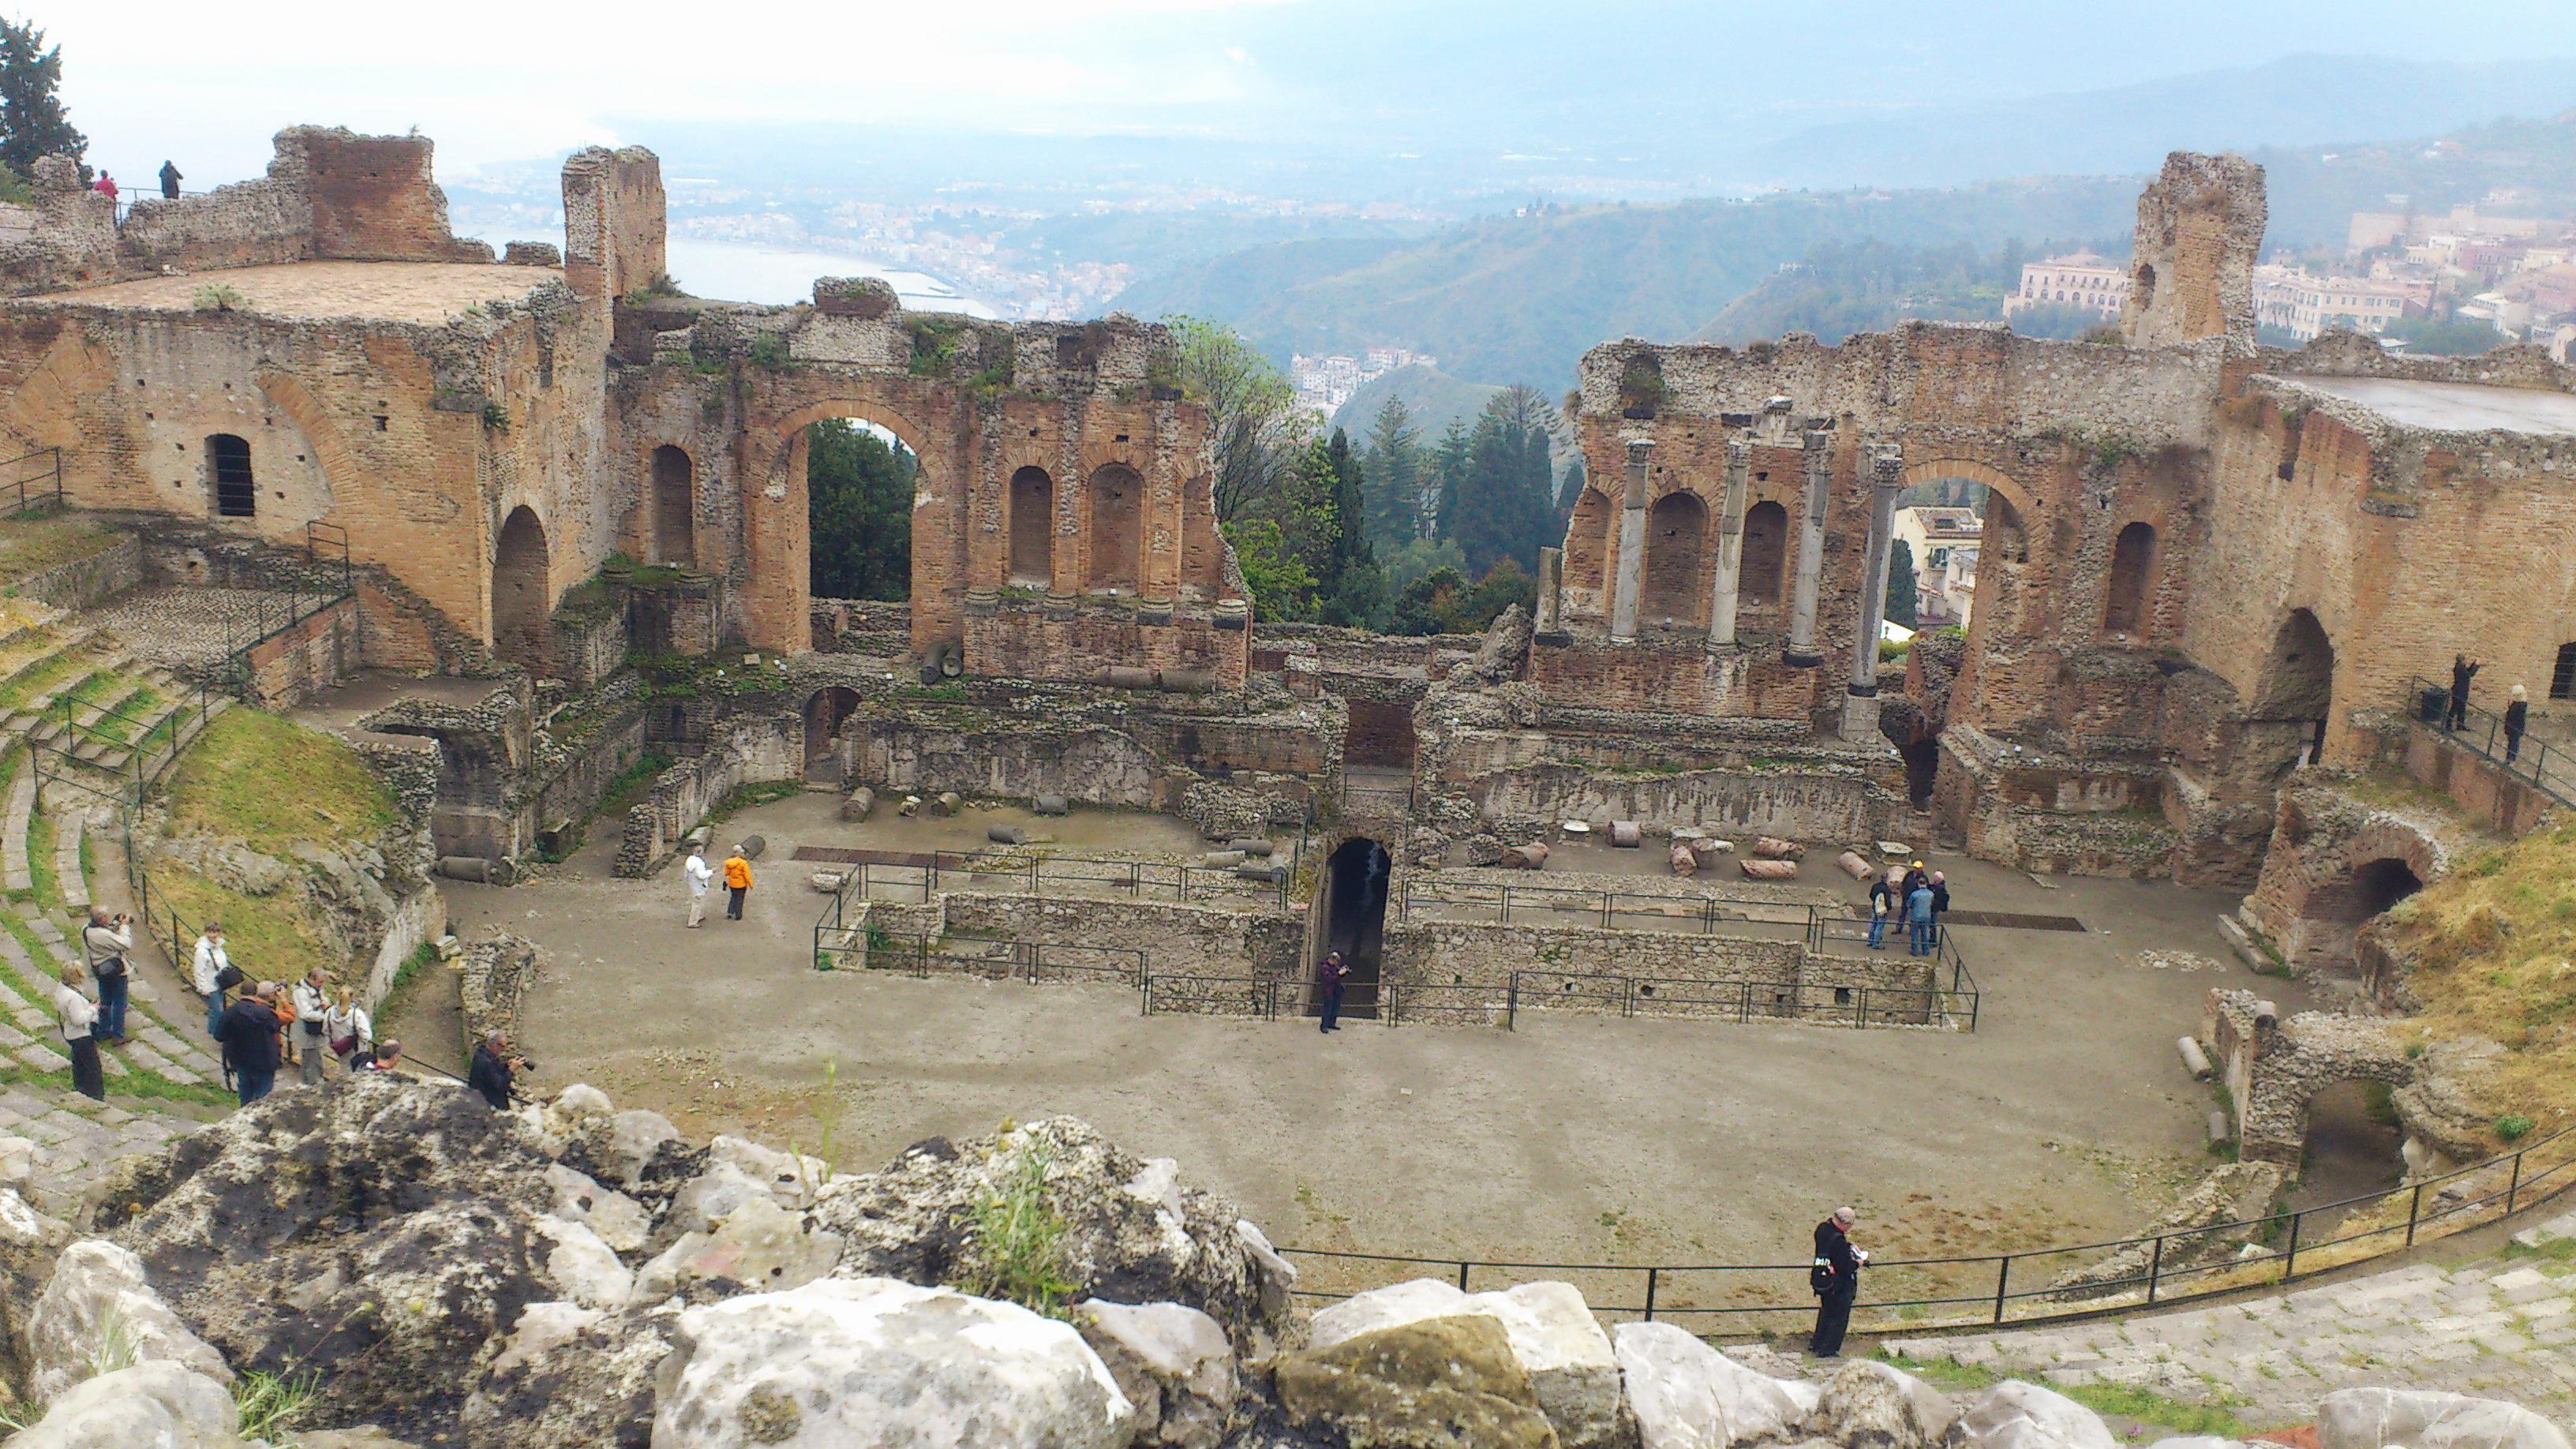 Teatro Greco Taormina Sicily view